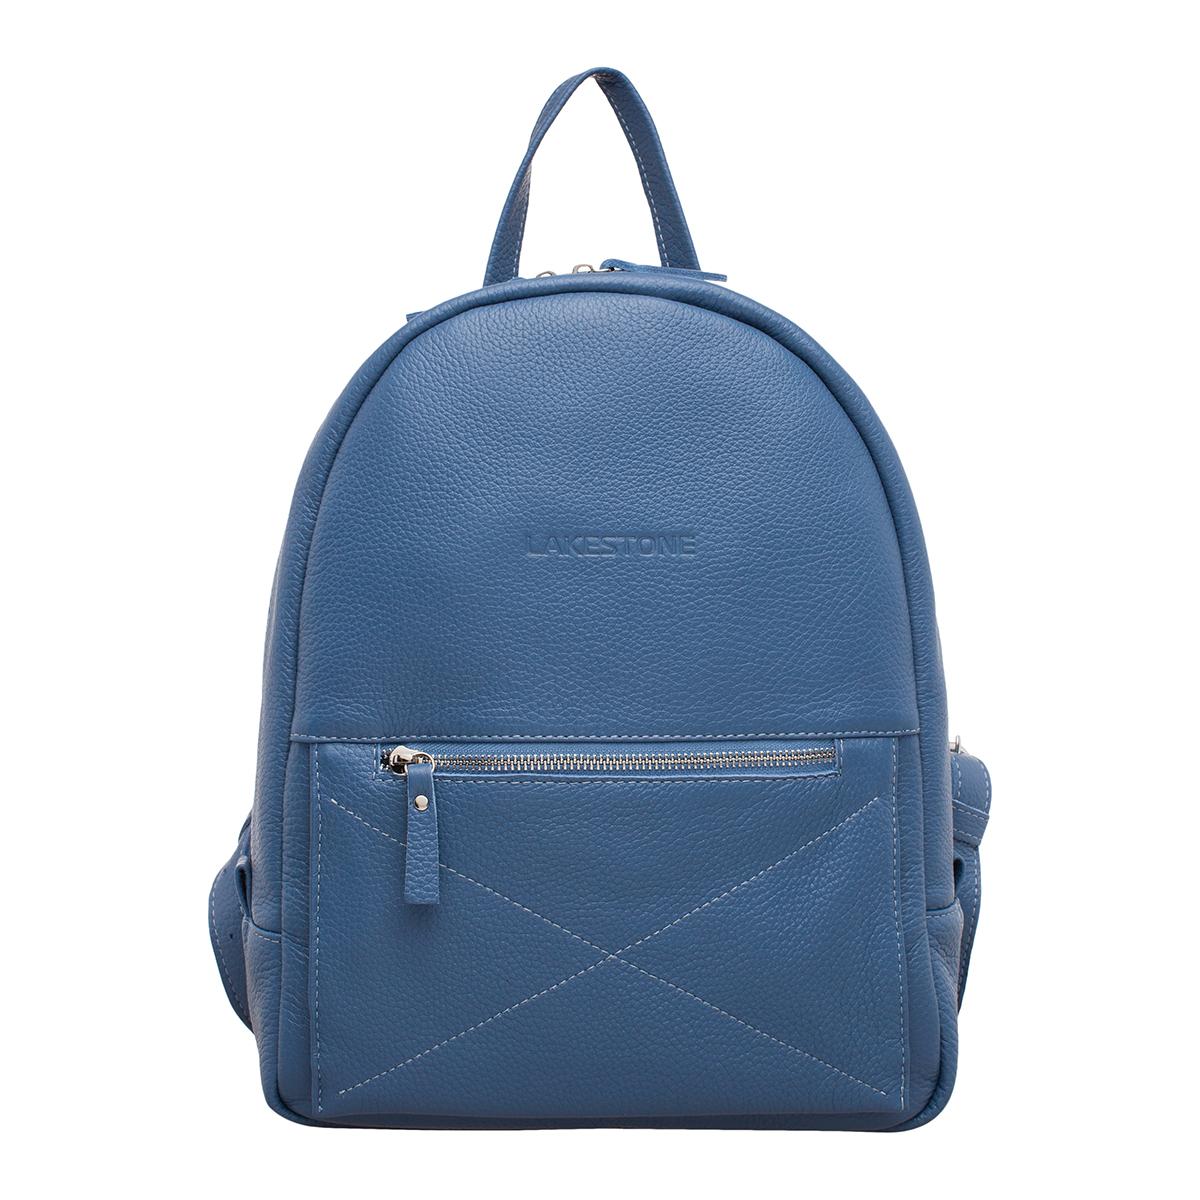 Рюкзак женский кожаный Lakestone 9123917/B